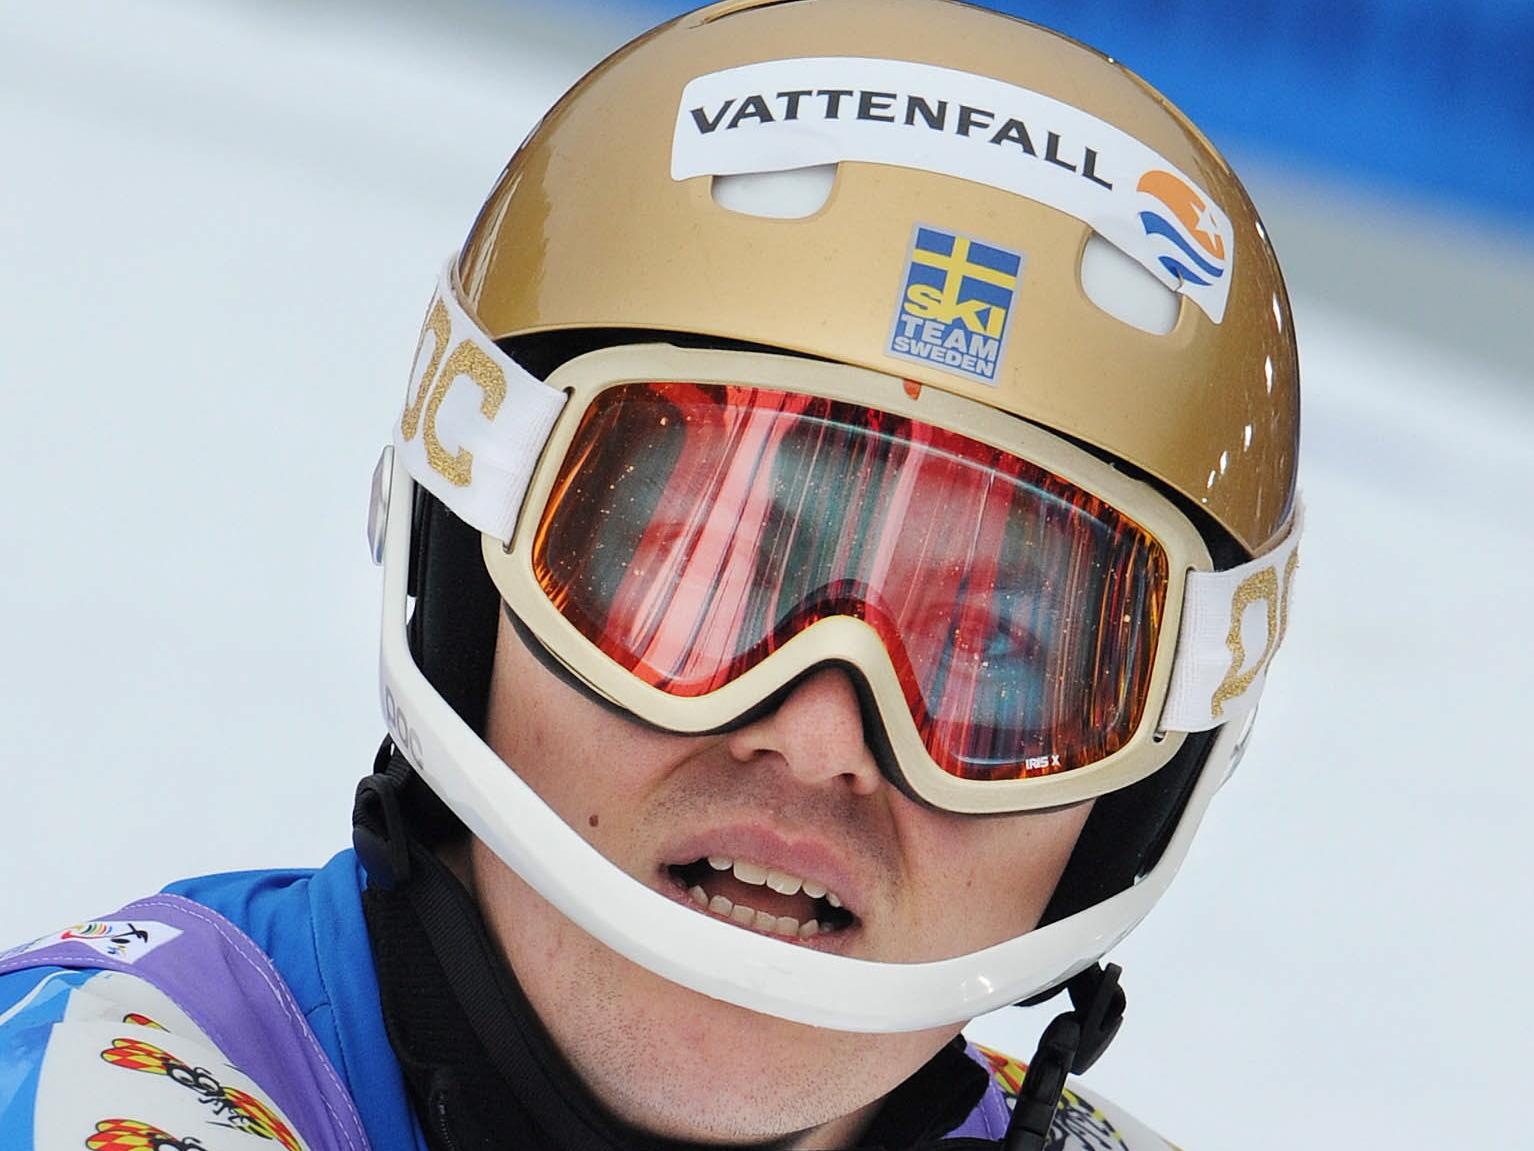 Skifahren: Helmtragen macht Sinn